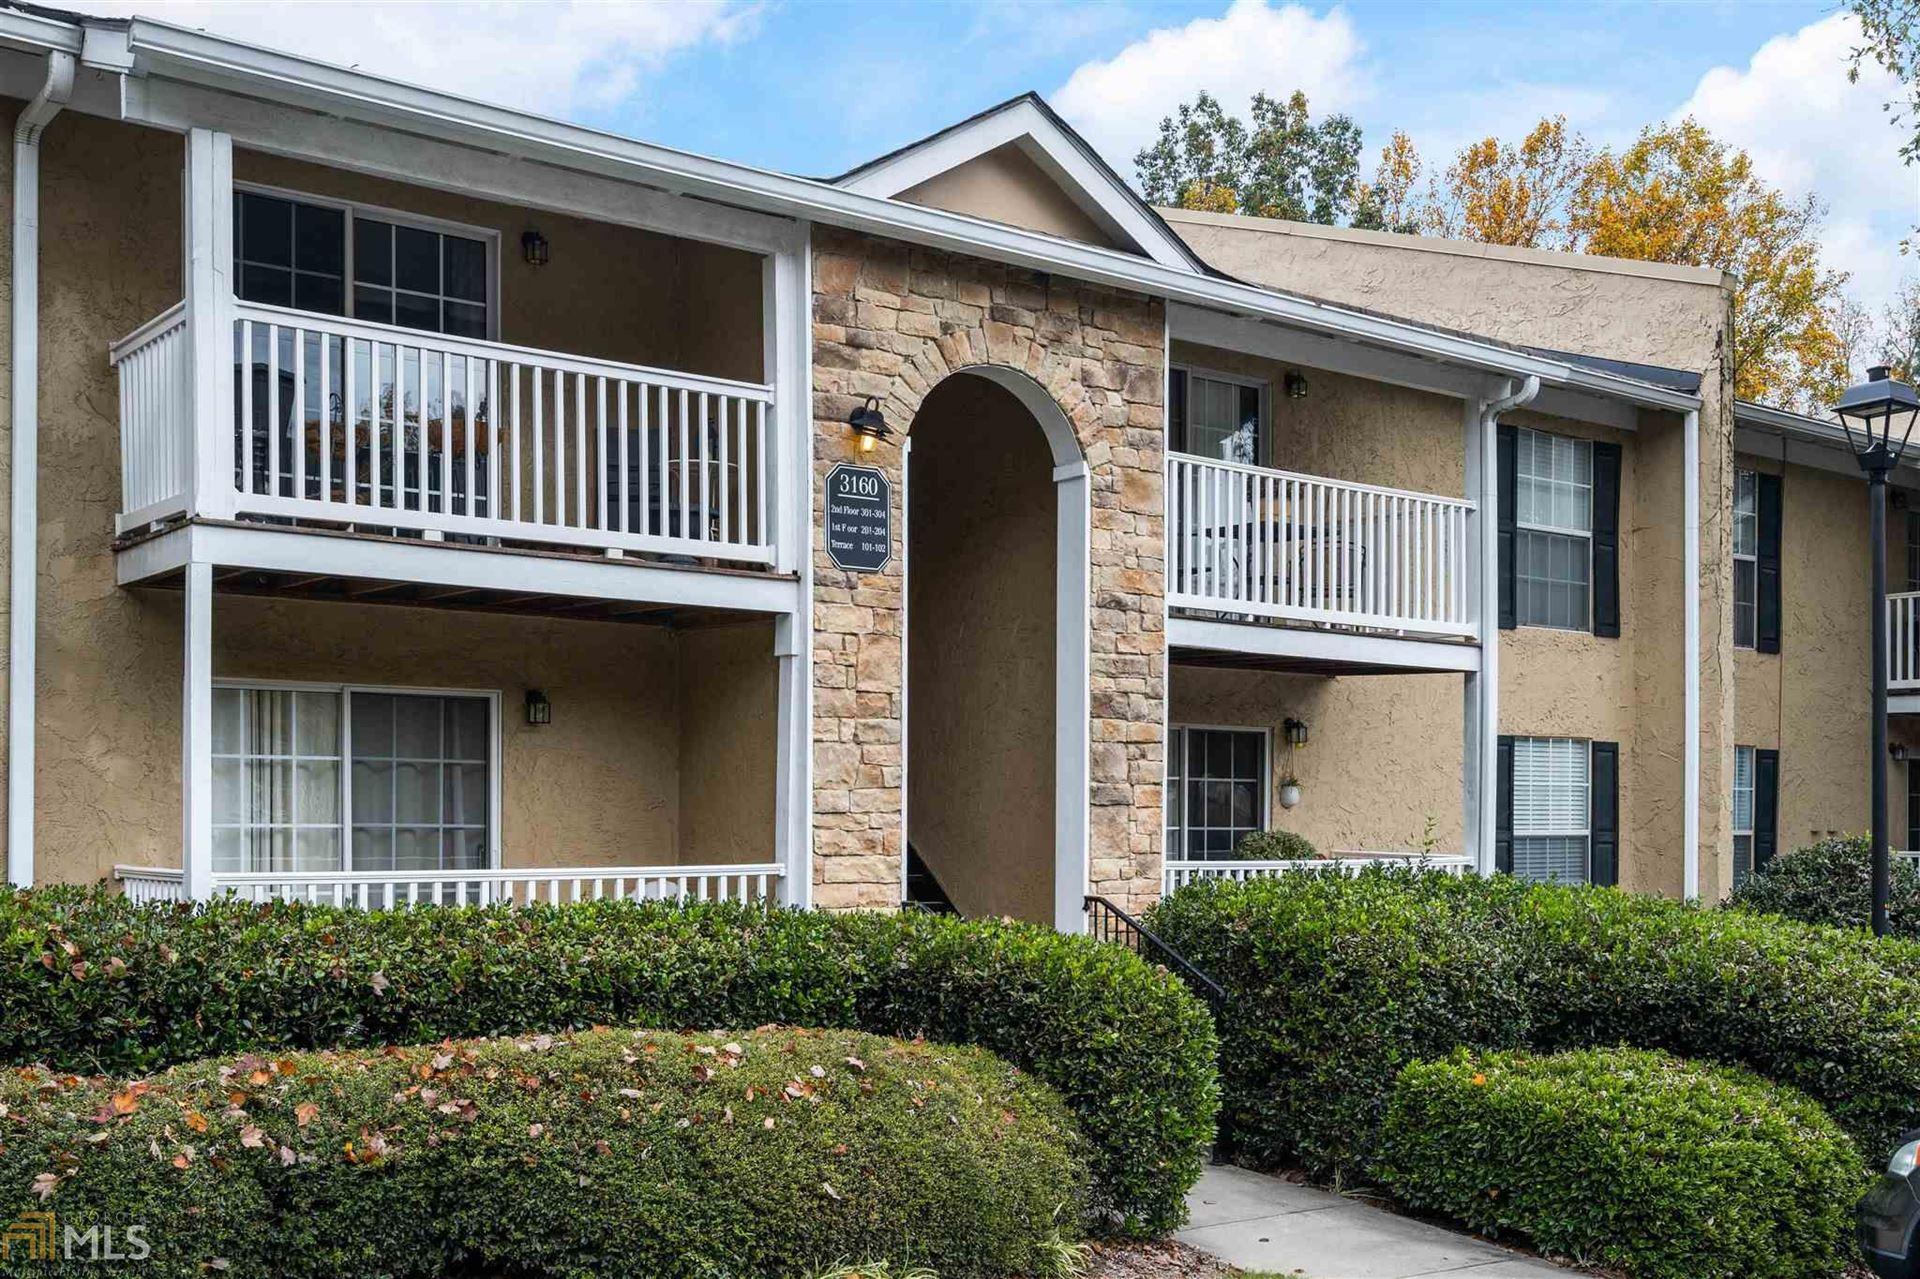 3160 Seven Pines Ct, Atlanta, GA 30339 - MLS#: 8888777